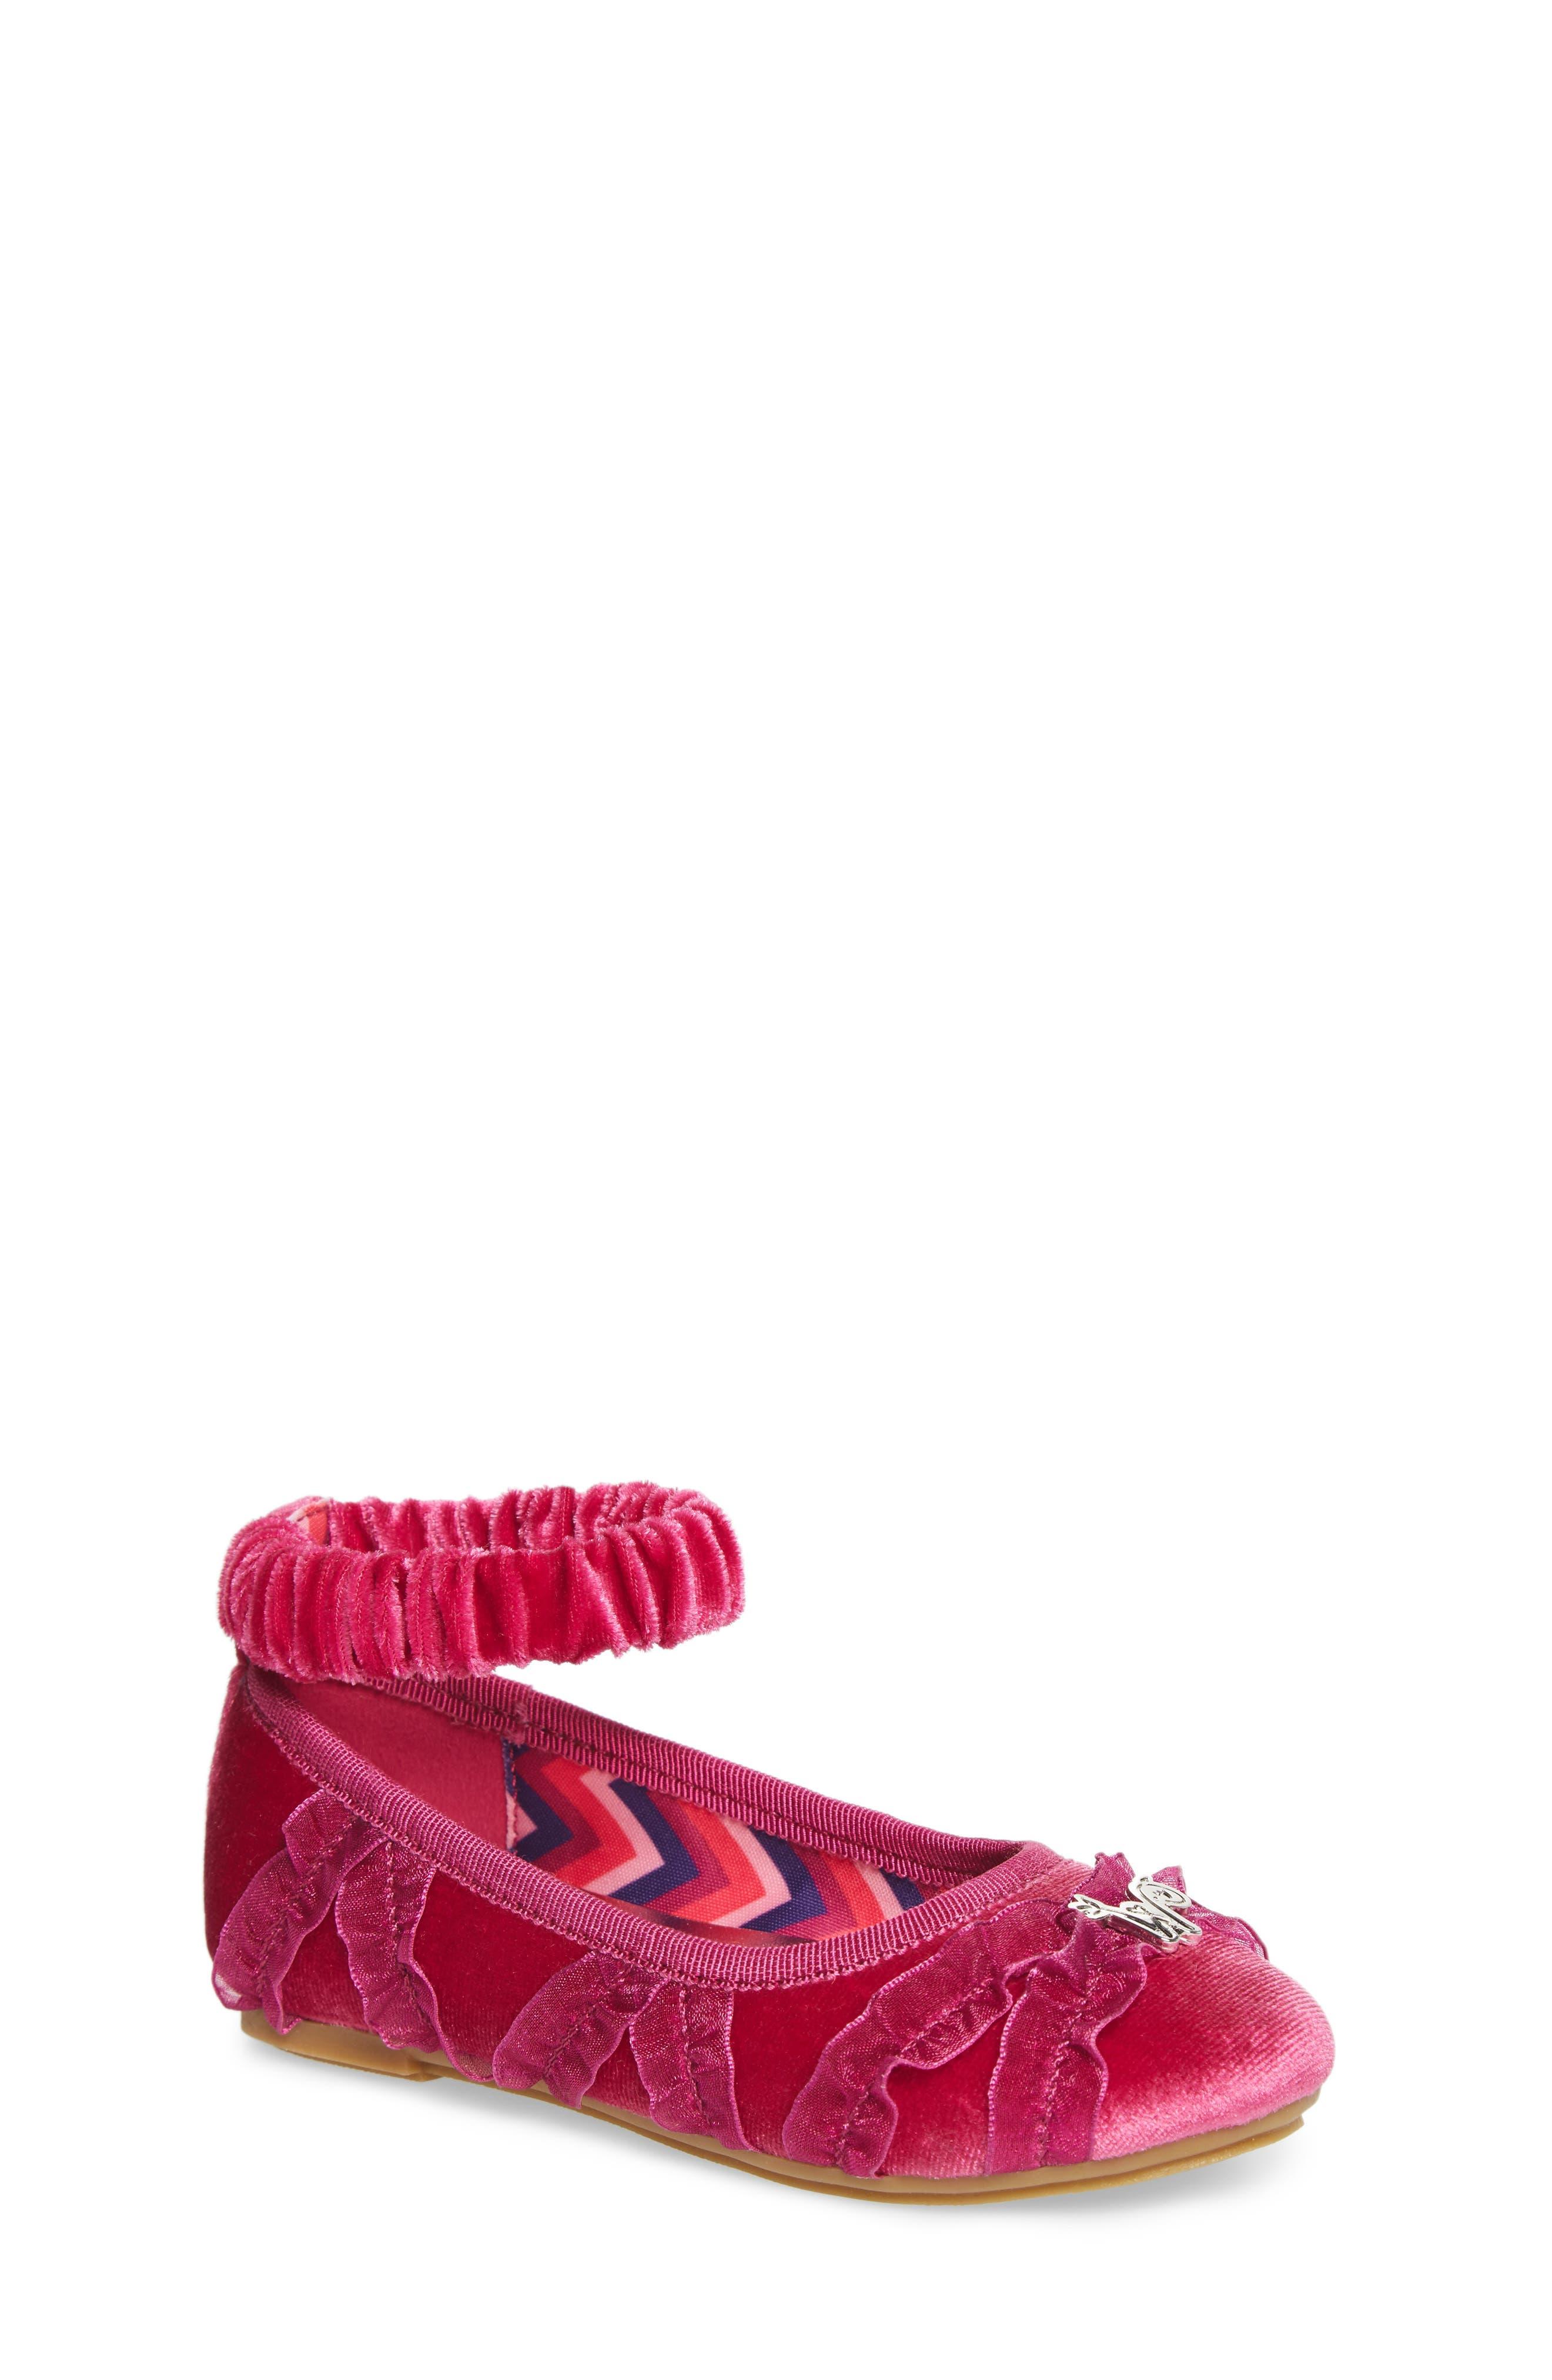 Emerson Ankle Strap Ballet Flat,                             Main thumbnail 1, color,                             650